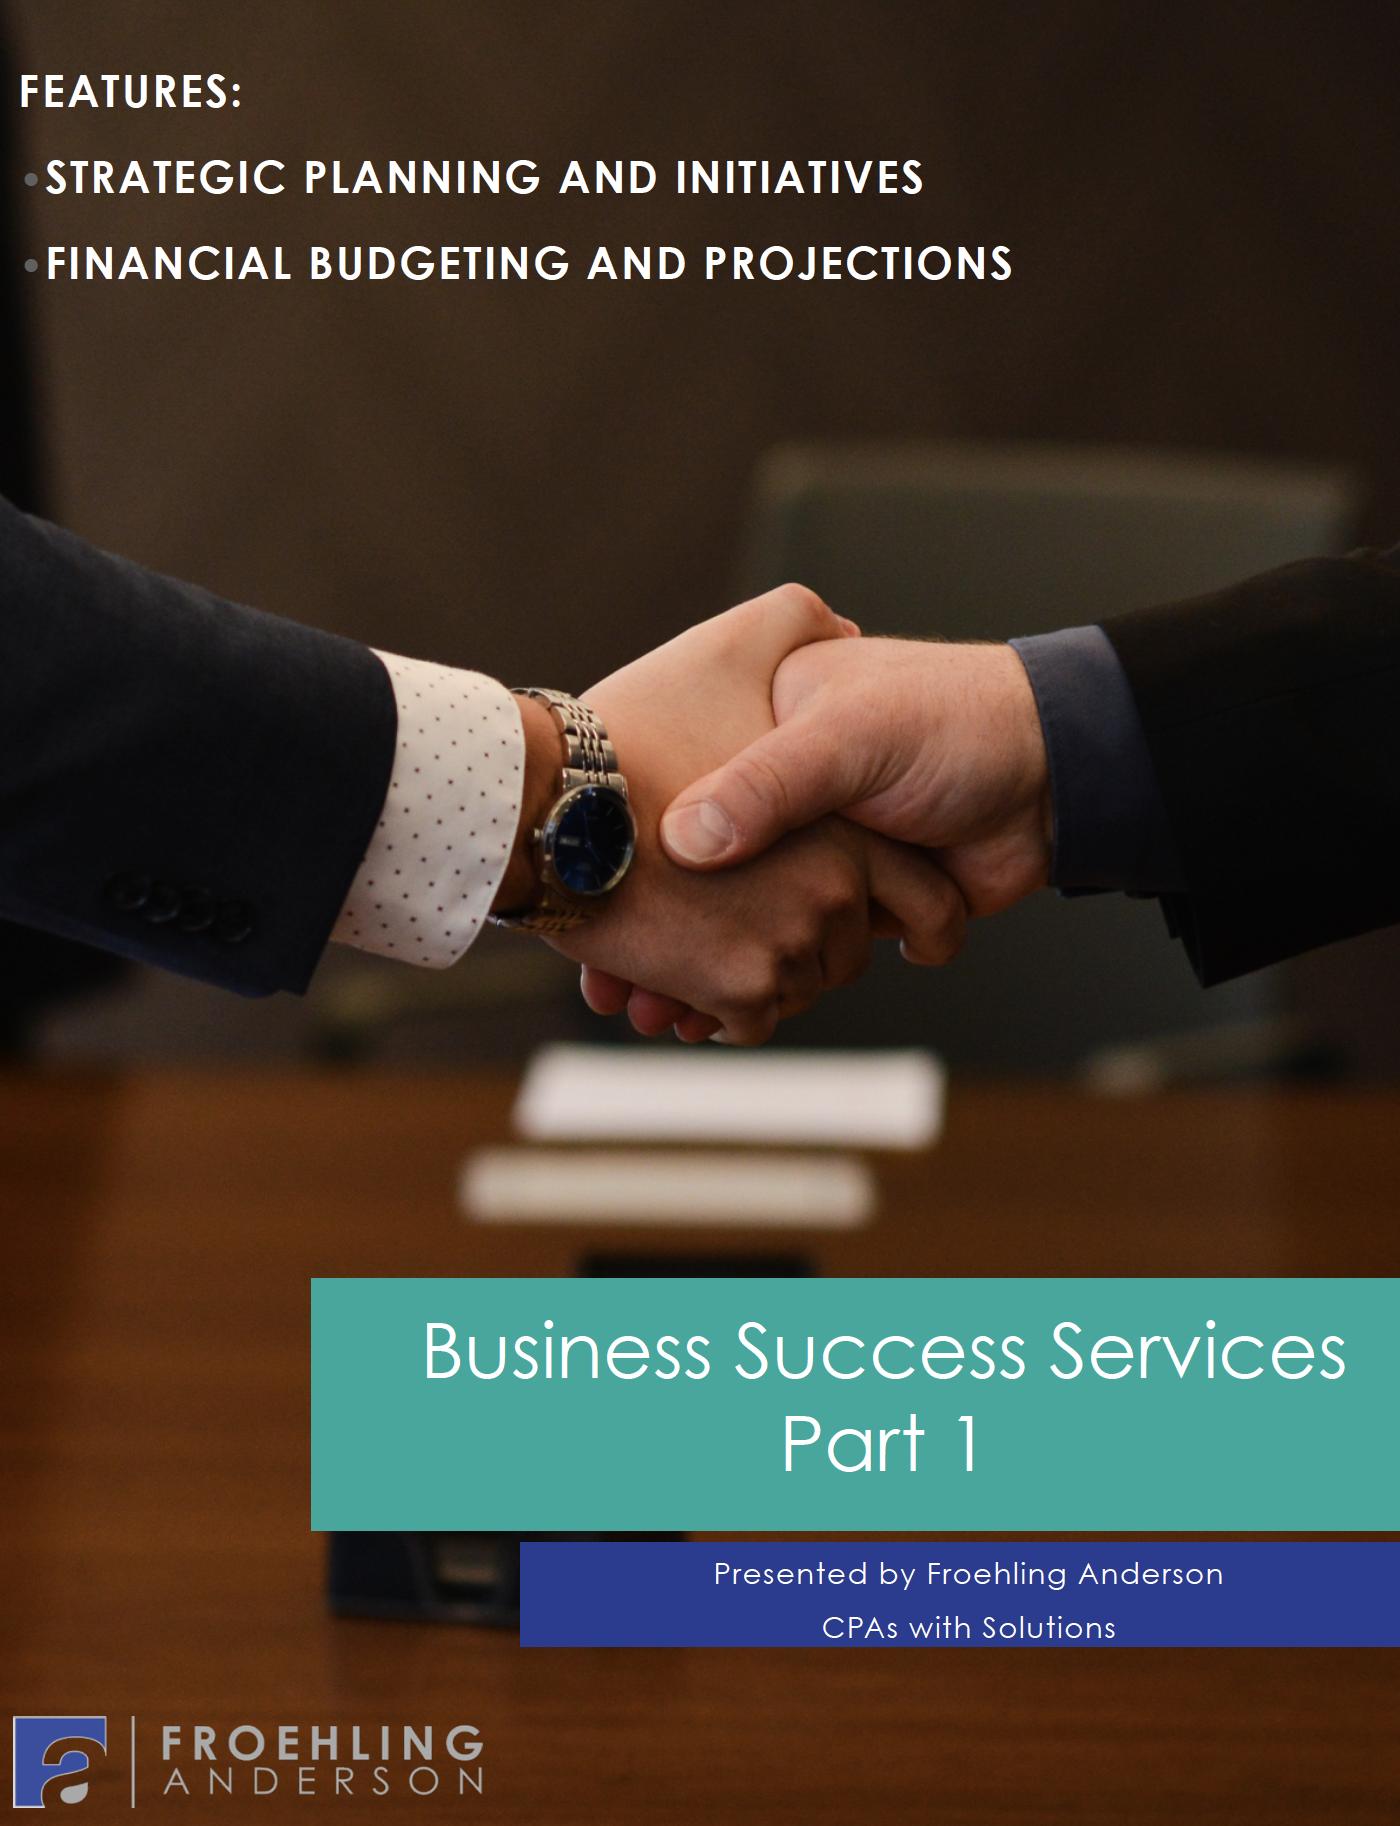 Download free eBook - Business Success Services - Part 1